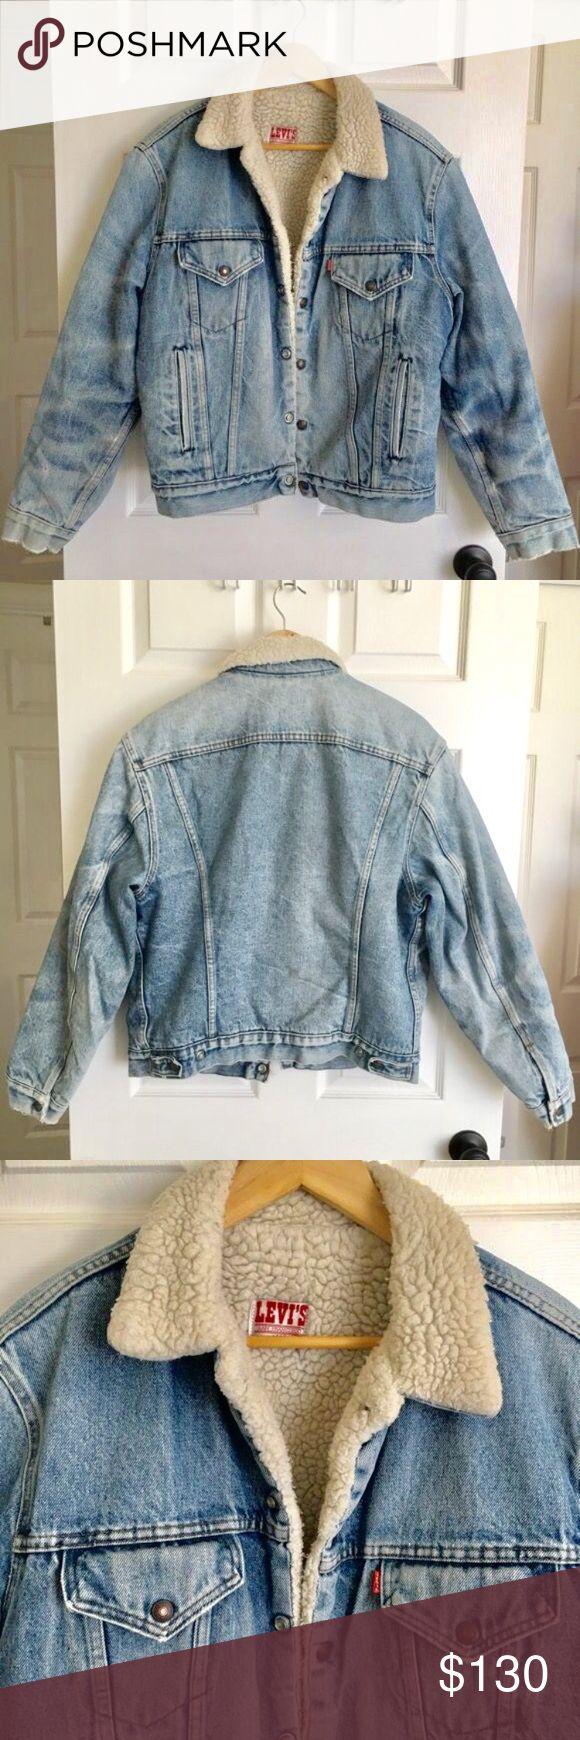 Vintage Levi's Sherpa Denim Jacket Get Coachella ready!   Levi's original San Francisco 1970s / 80s men's Jean jacket.   Size 44R   Good condition. Year round hispster jacket. Seen on celebs like Zac Efron, David Beckham, Tom Hardy... Levi's Jeans